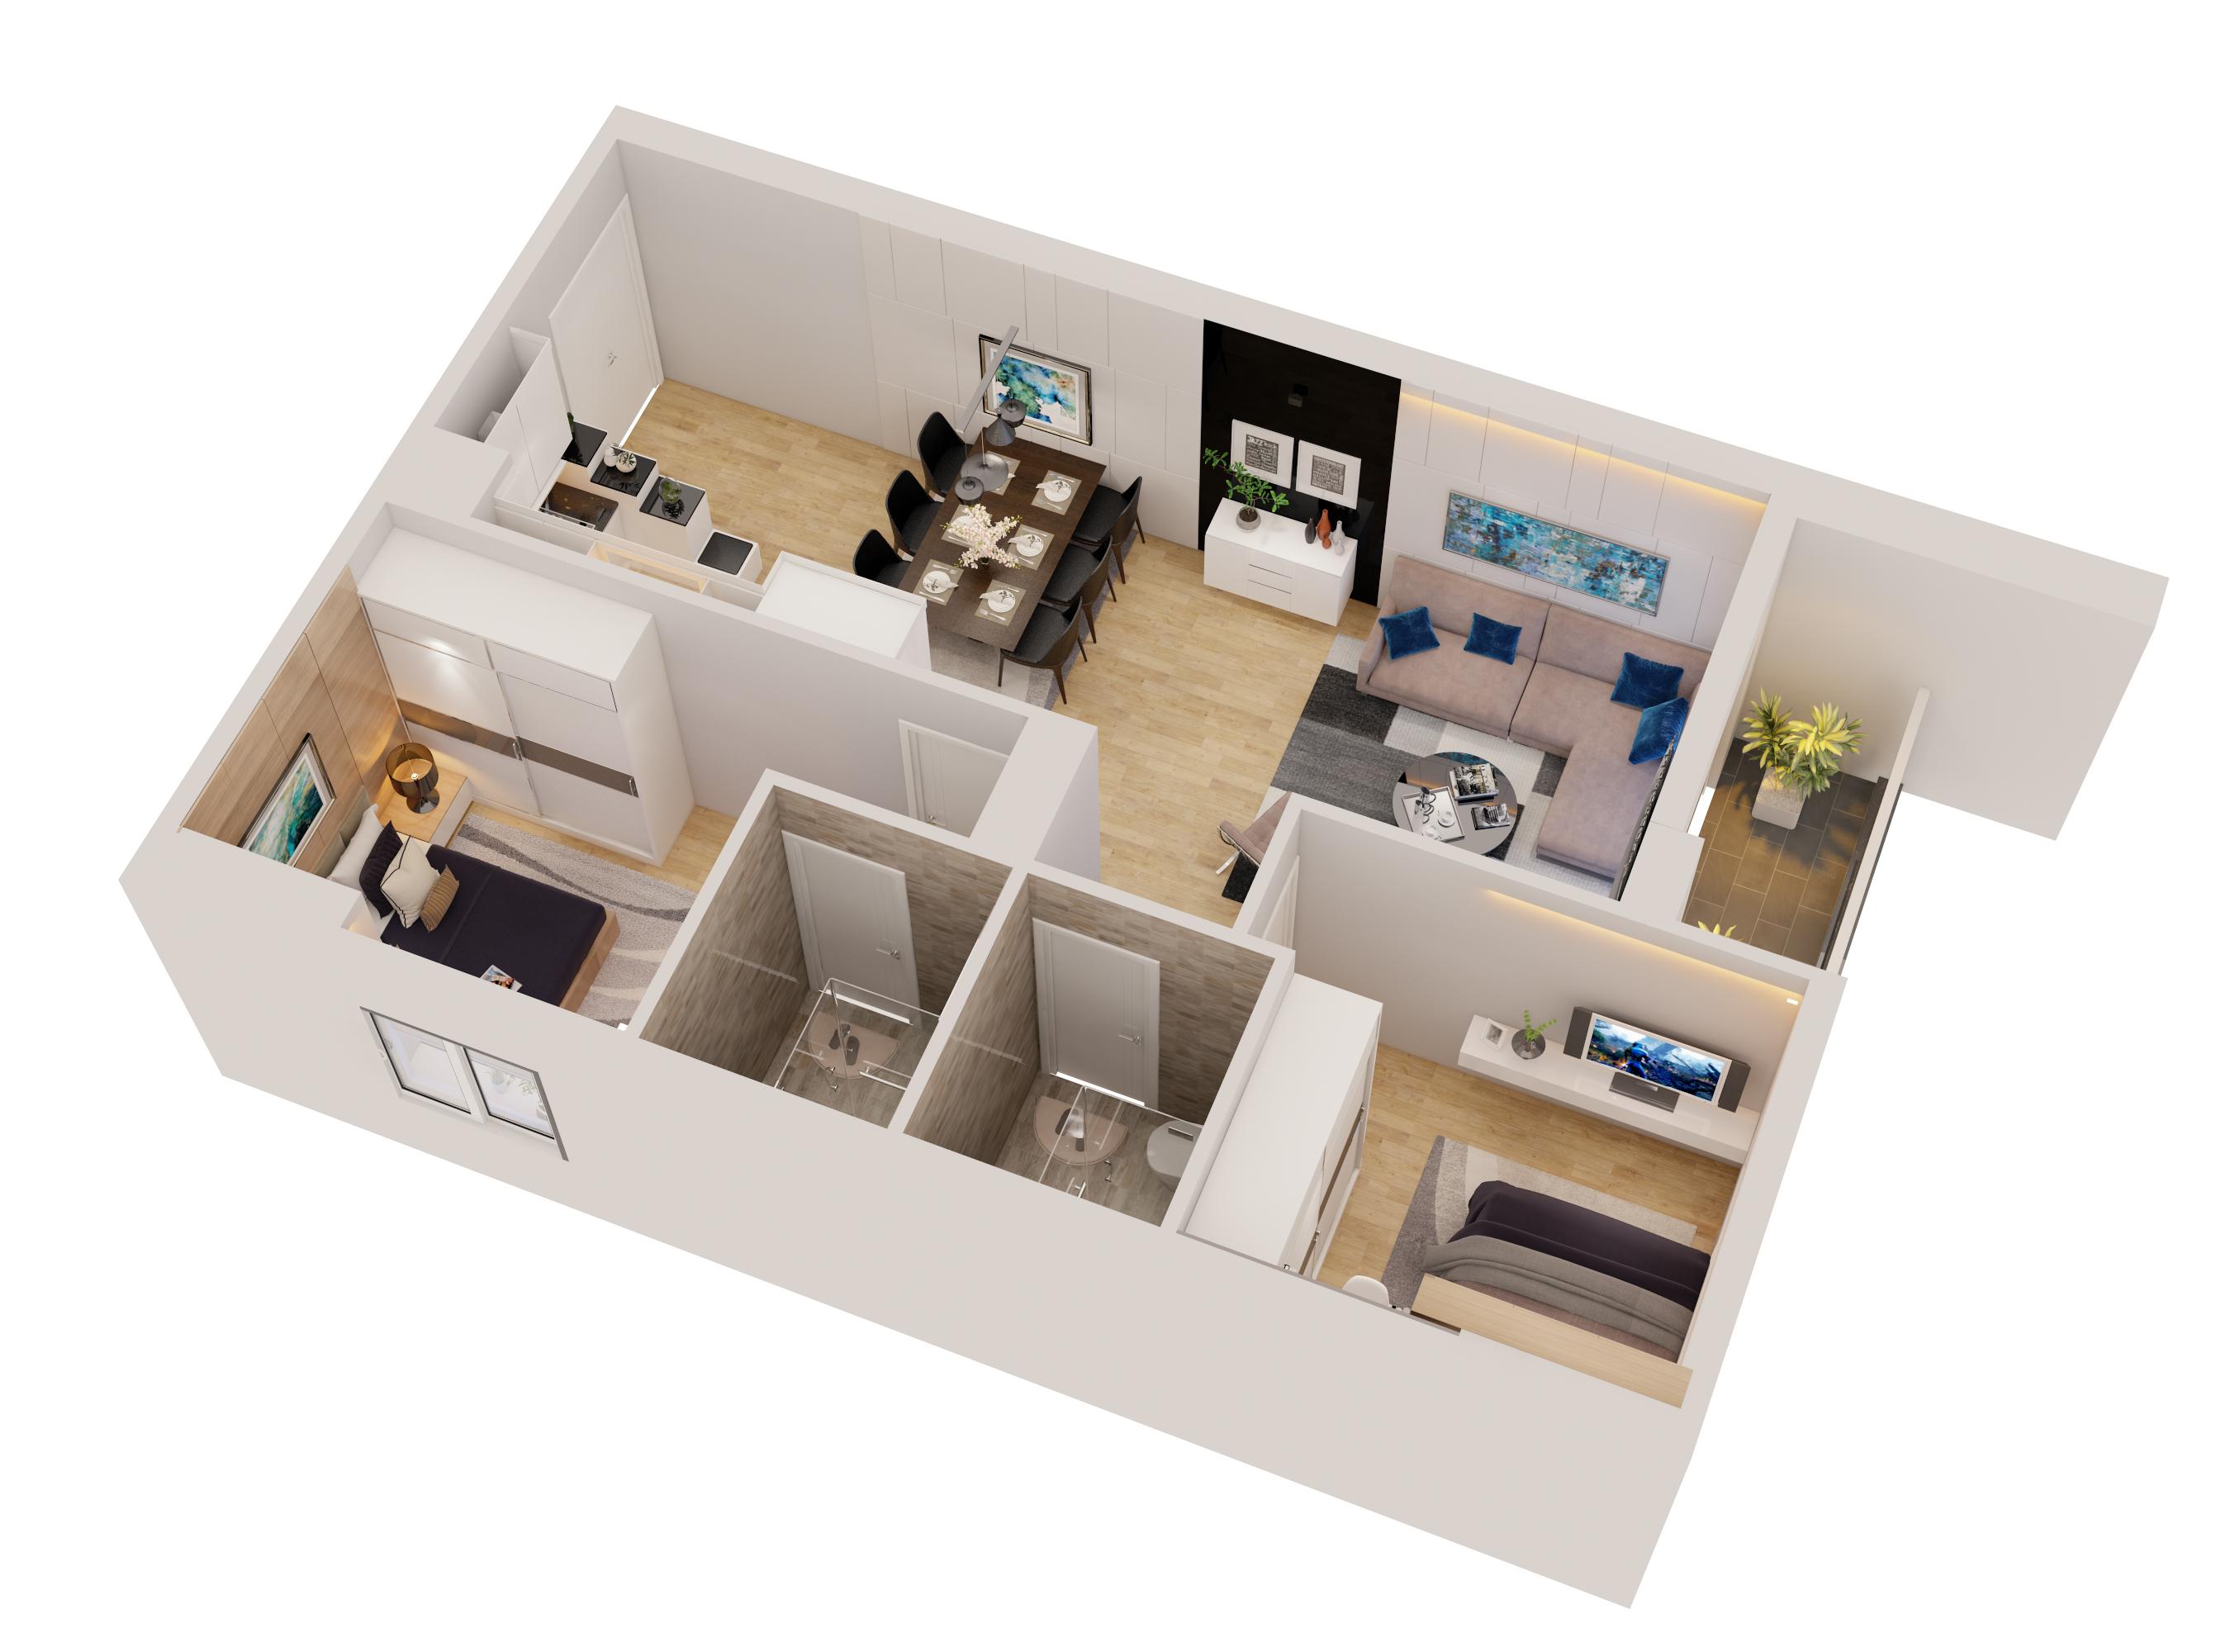 Cutaway apartment full furnitures modern design 3d model max 279954